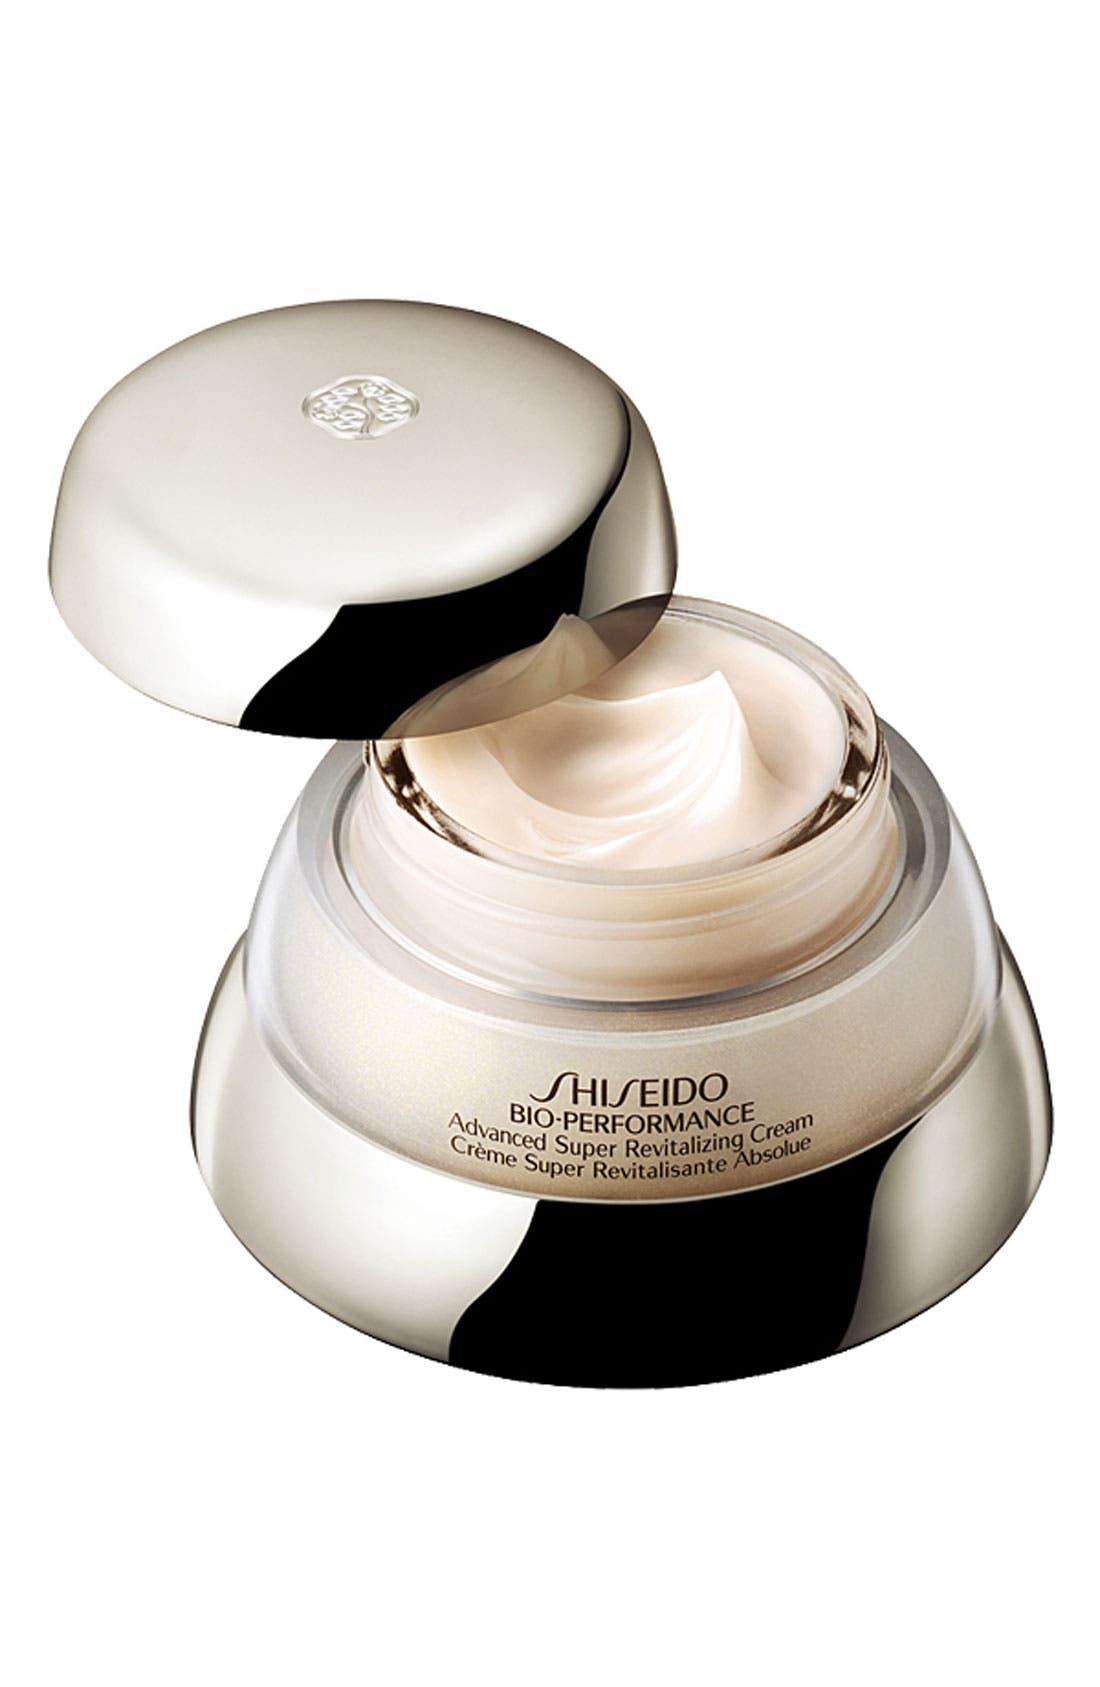 Bio-Performance Advance Super Revitalizing Moisturizer Cream